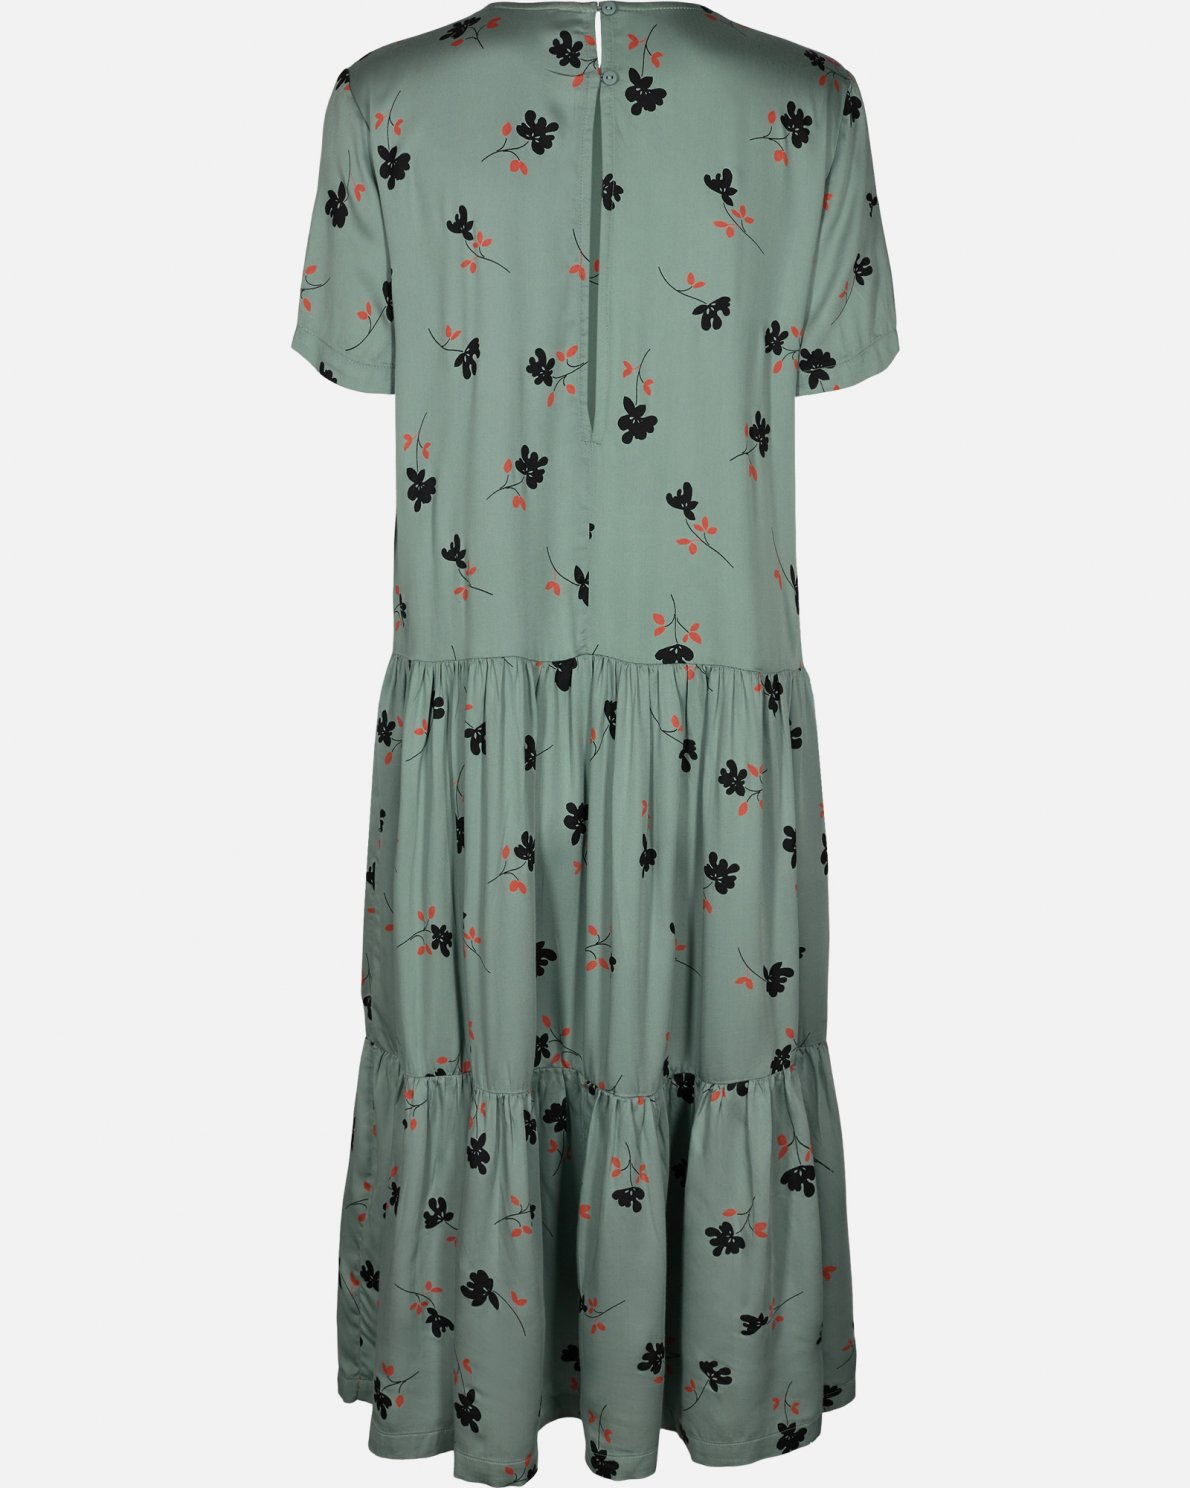 Fria Nor dress